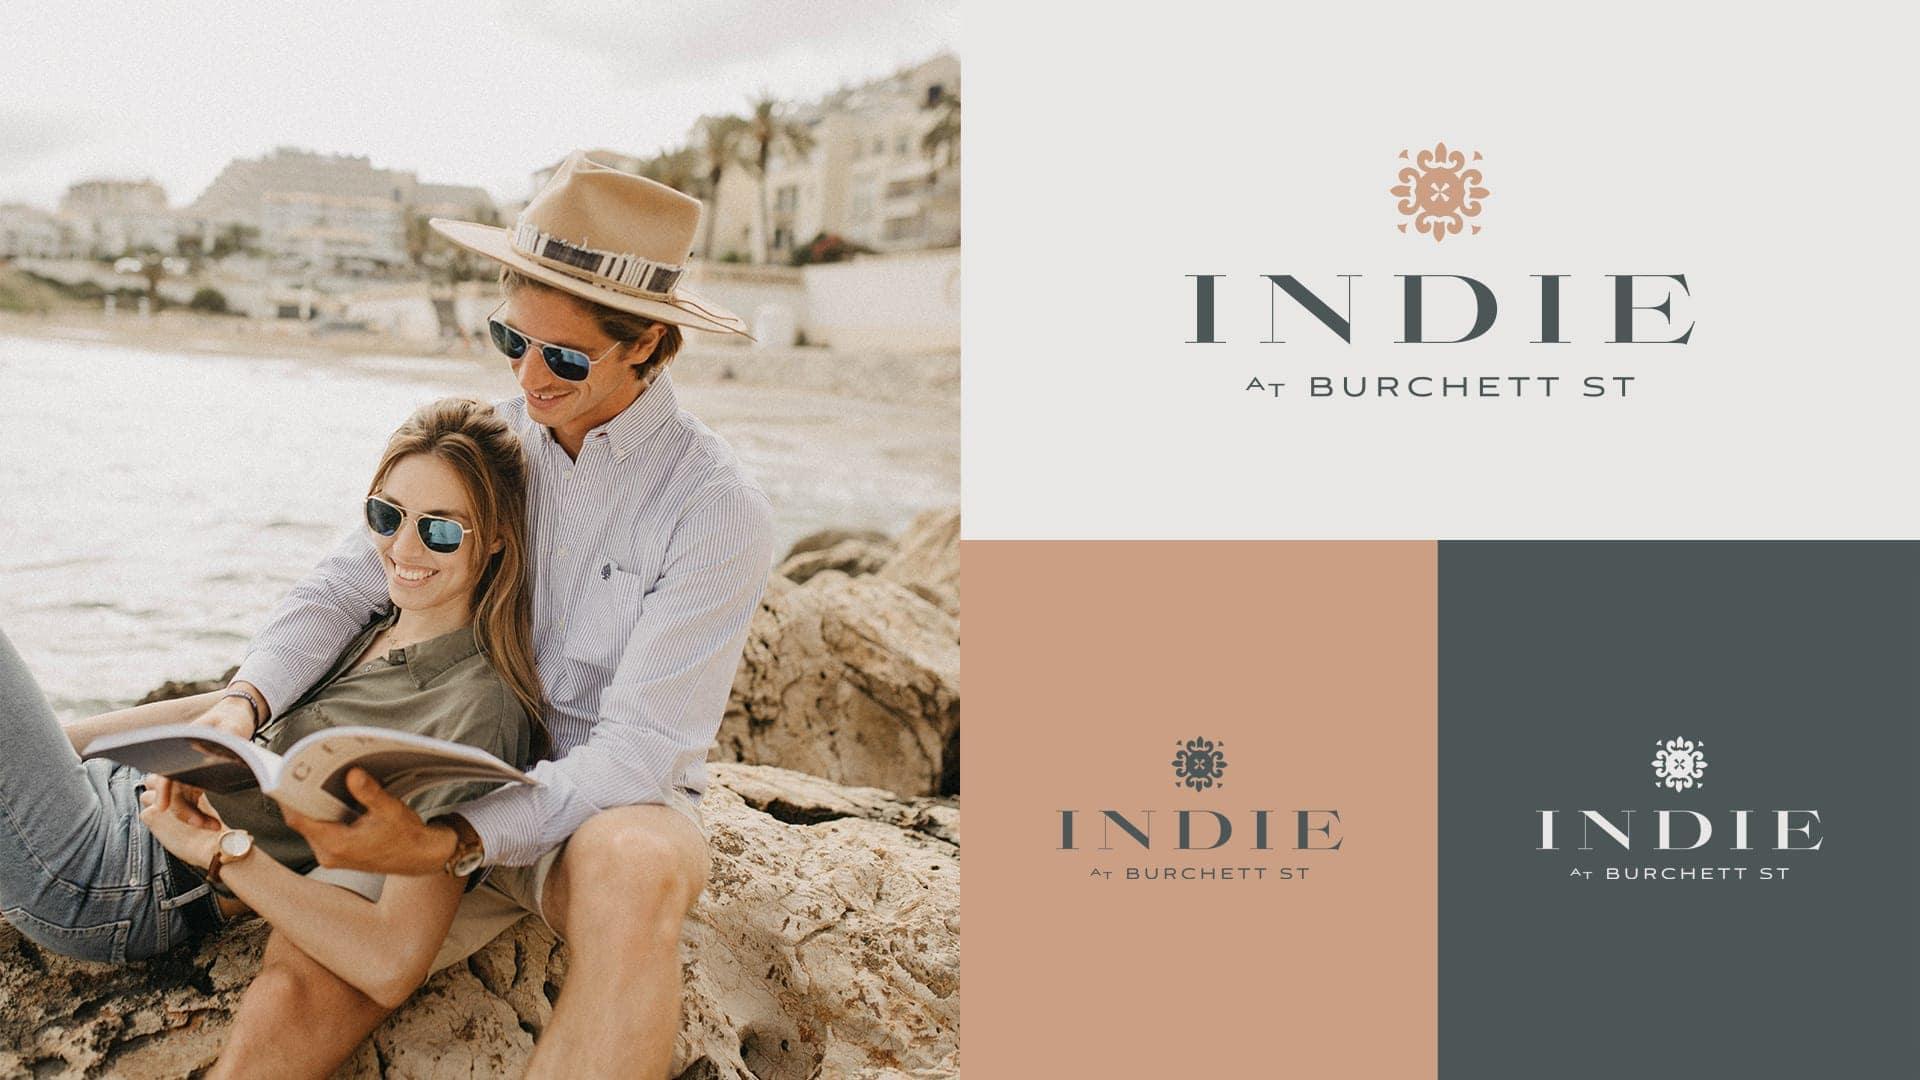 The Indie Collection Burchett St Logo - Unsung Studio Branding